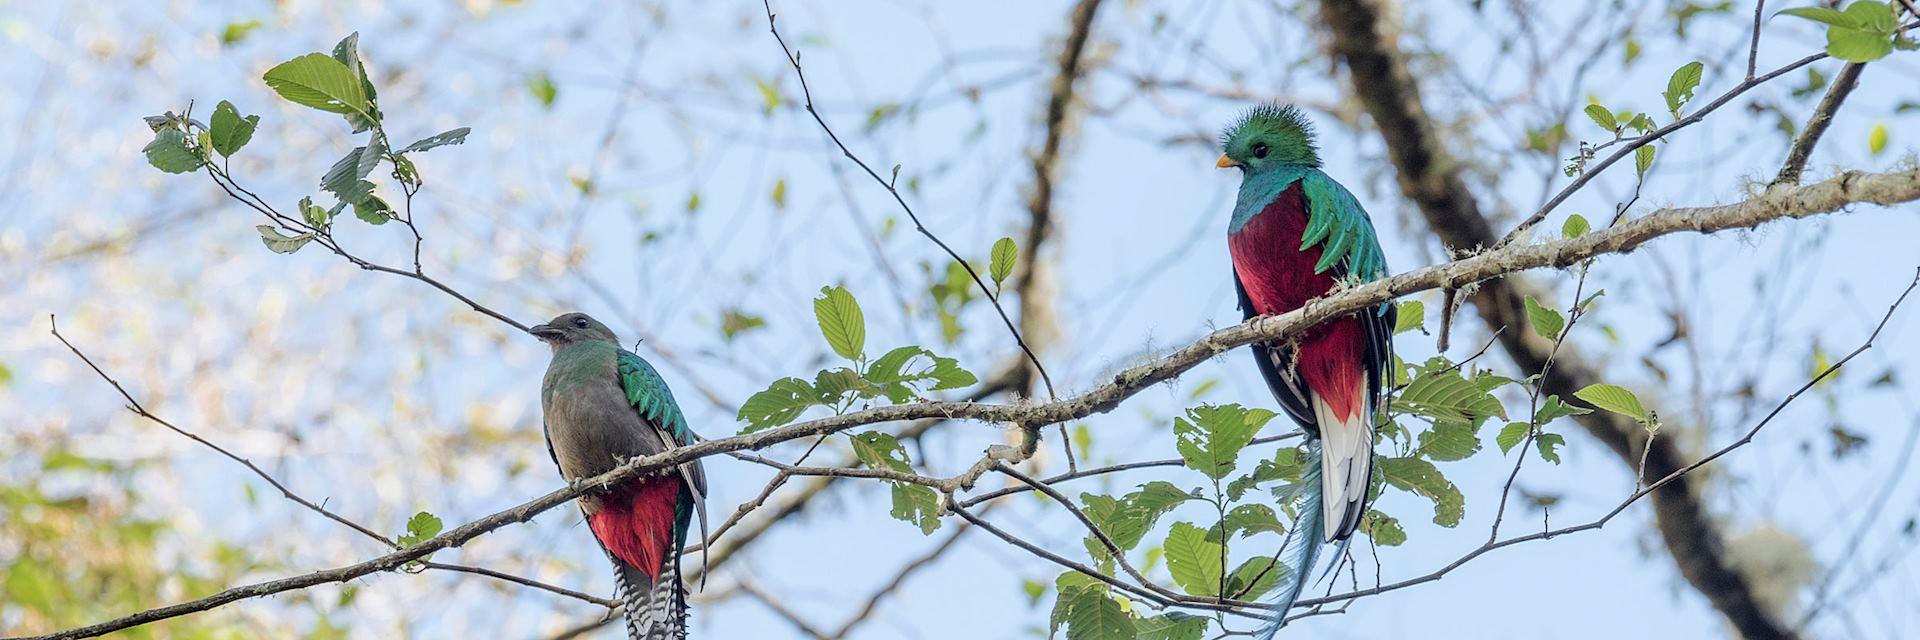 The elusive quetzal